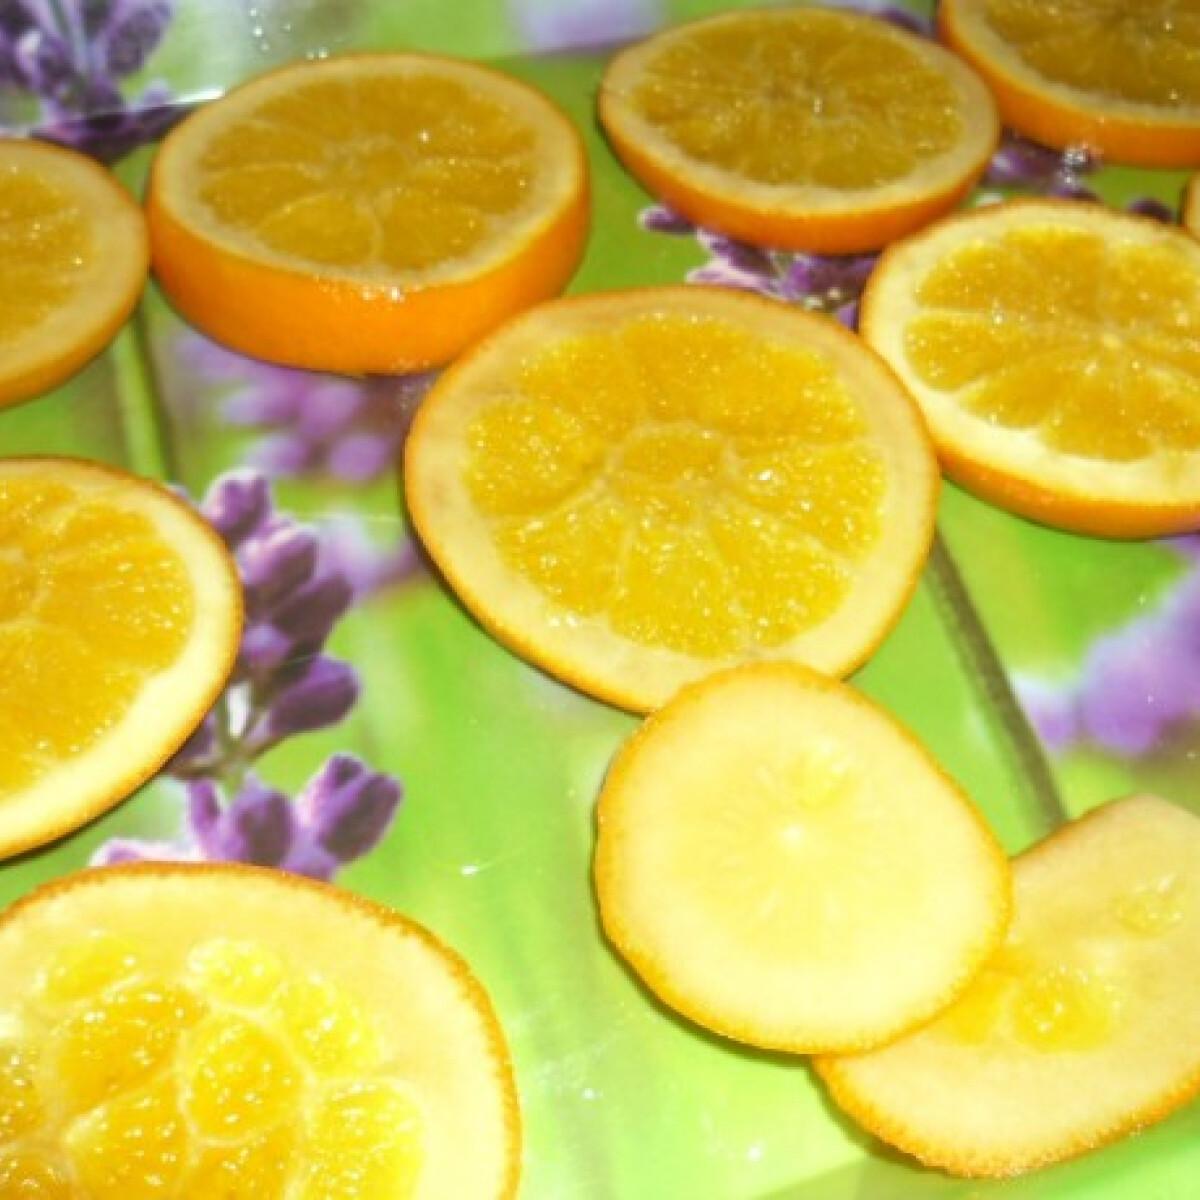 Ezen a képen: Cukrozott narancs